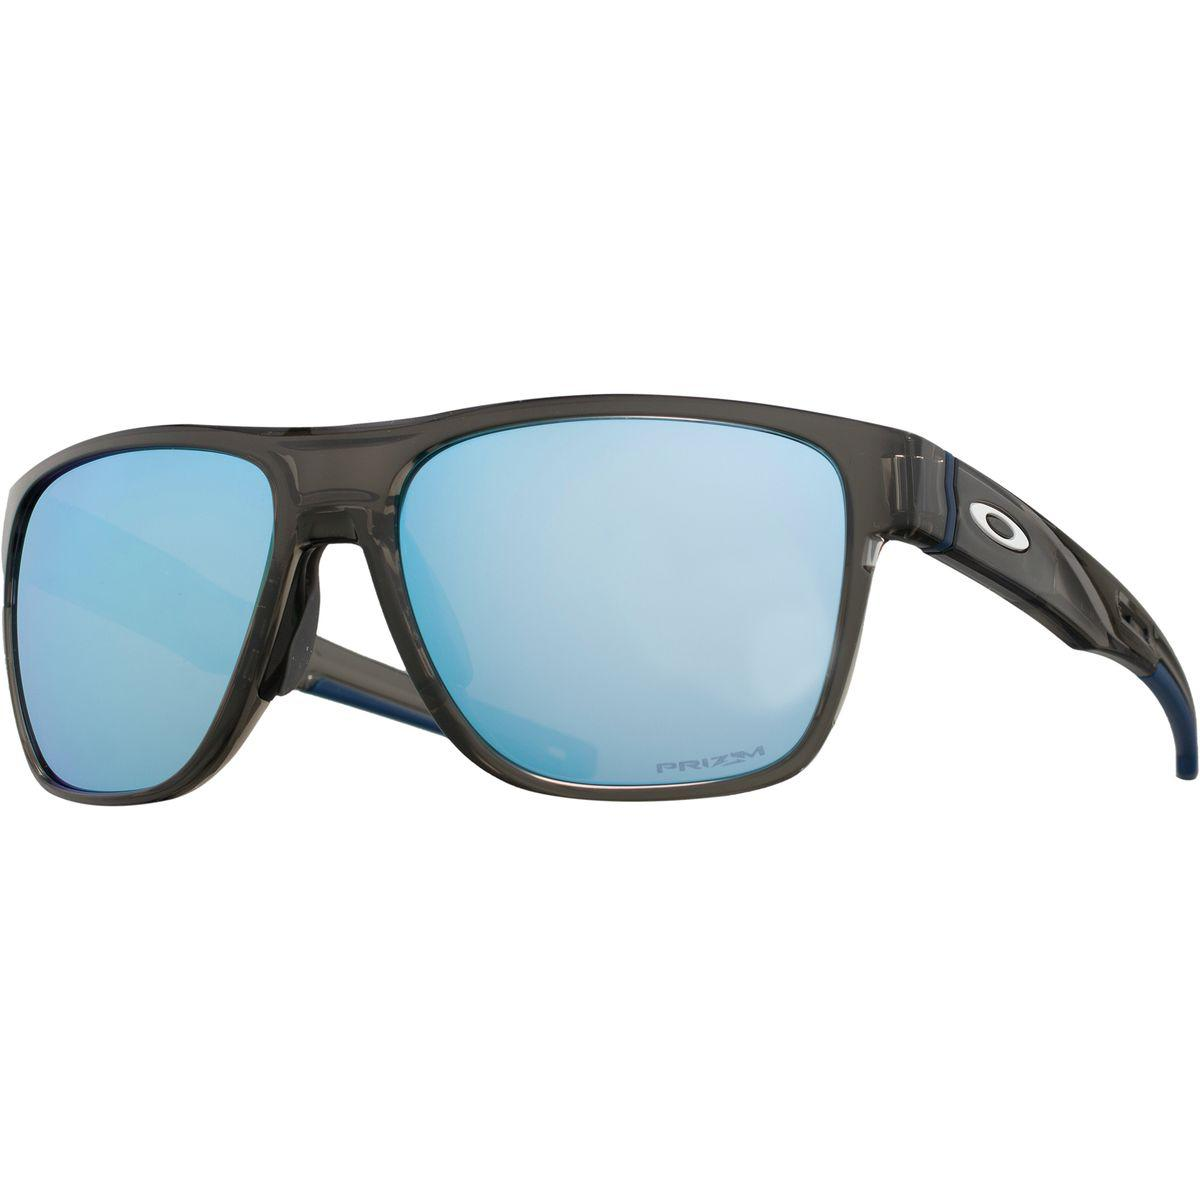 bba202e01a Lyst - Oakley Crossrange Xl Prizm Sunglasses - Polarized in Blue for Men